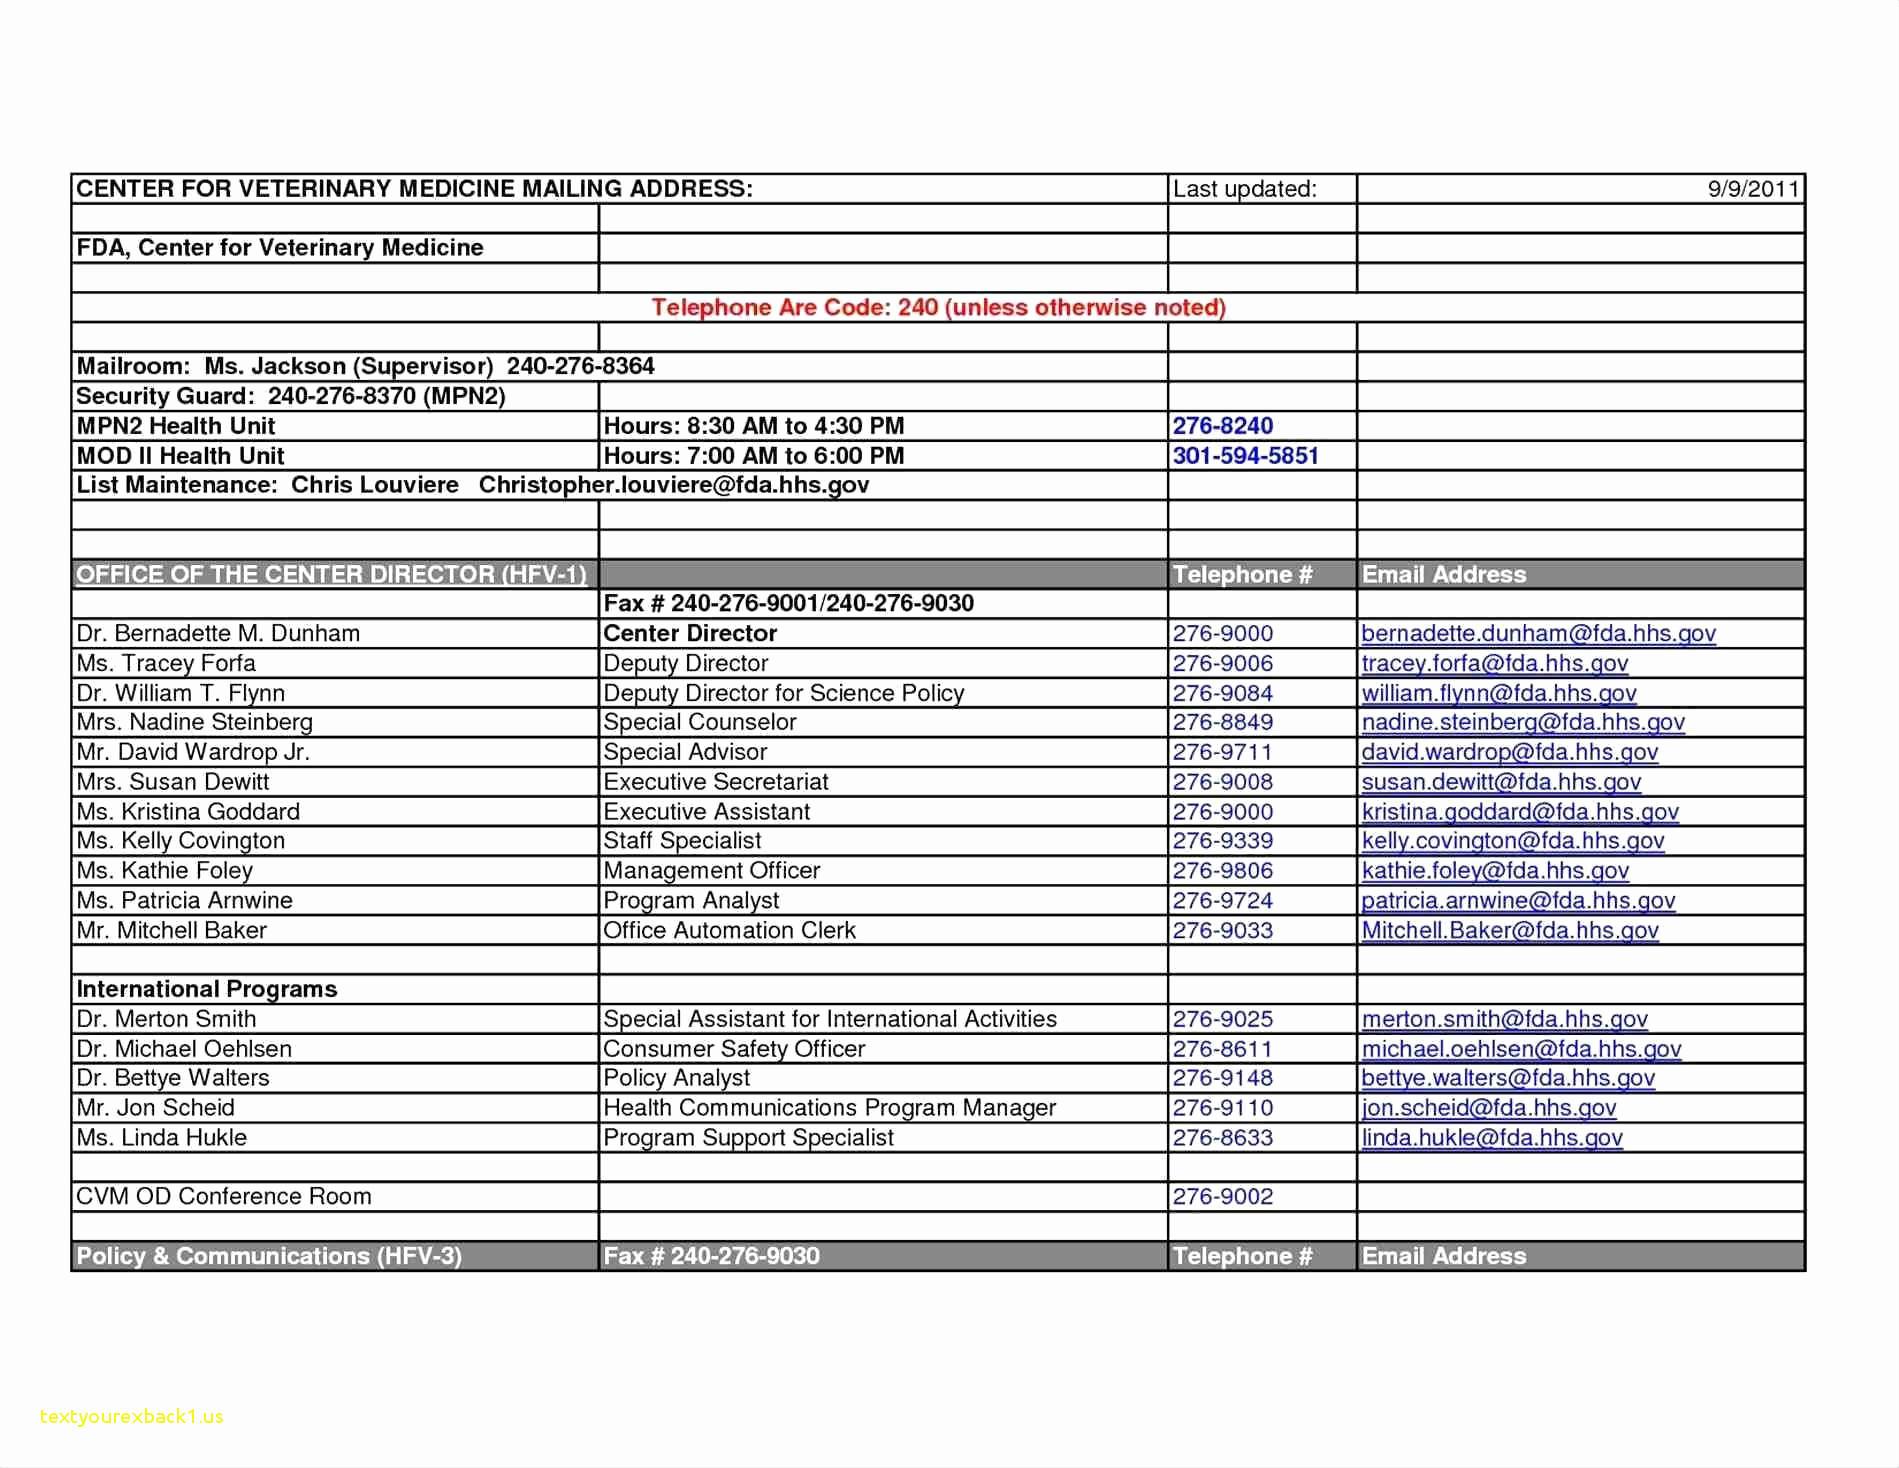 2016 Fillable 1099 Form Inspirational Employee Form Templates W2 Printable Unique 1099 Pensation